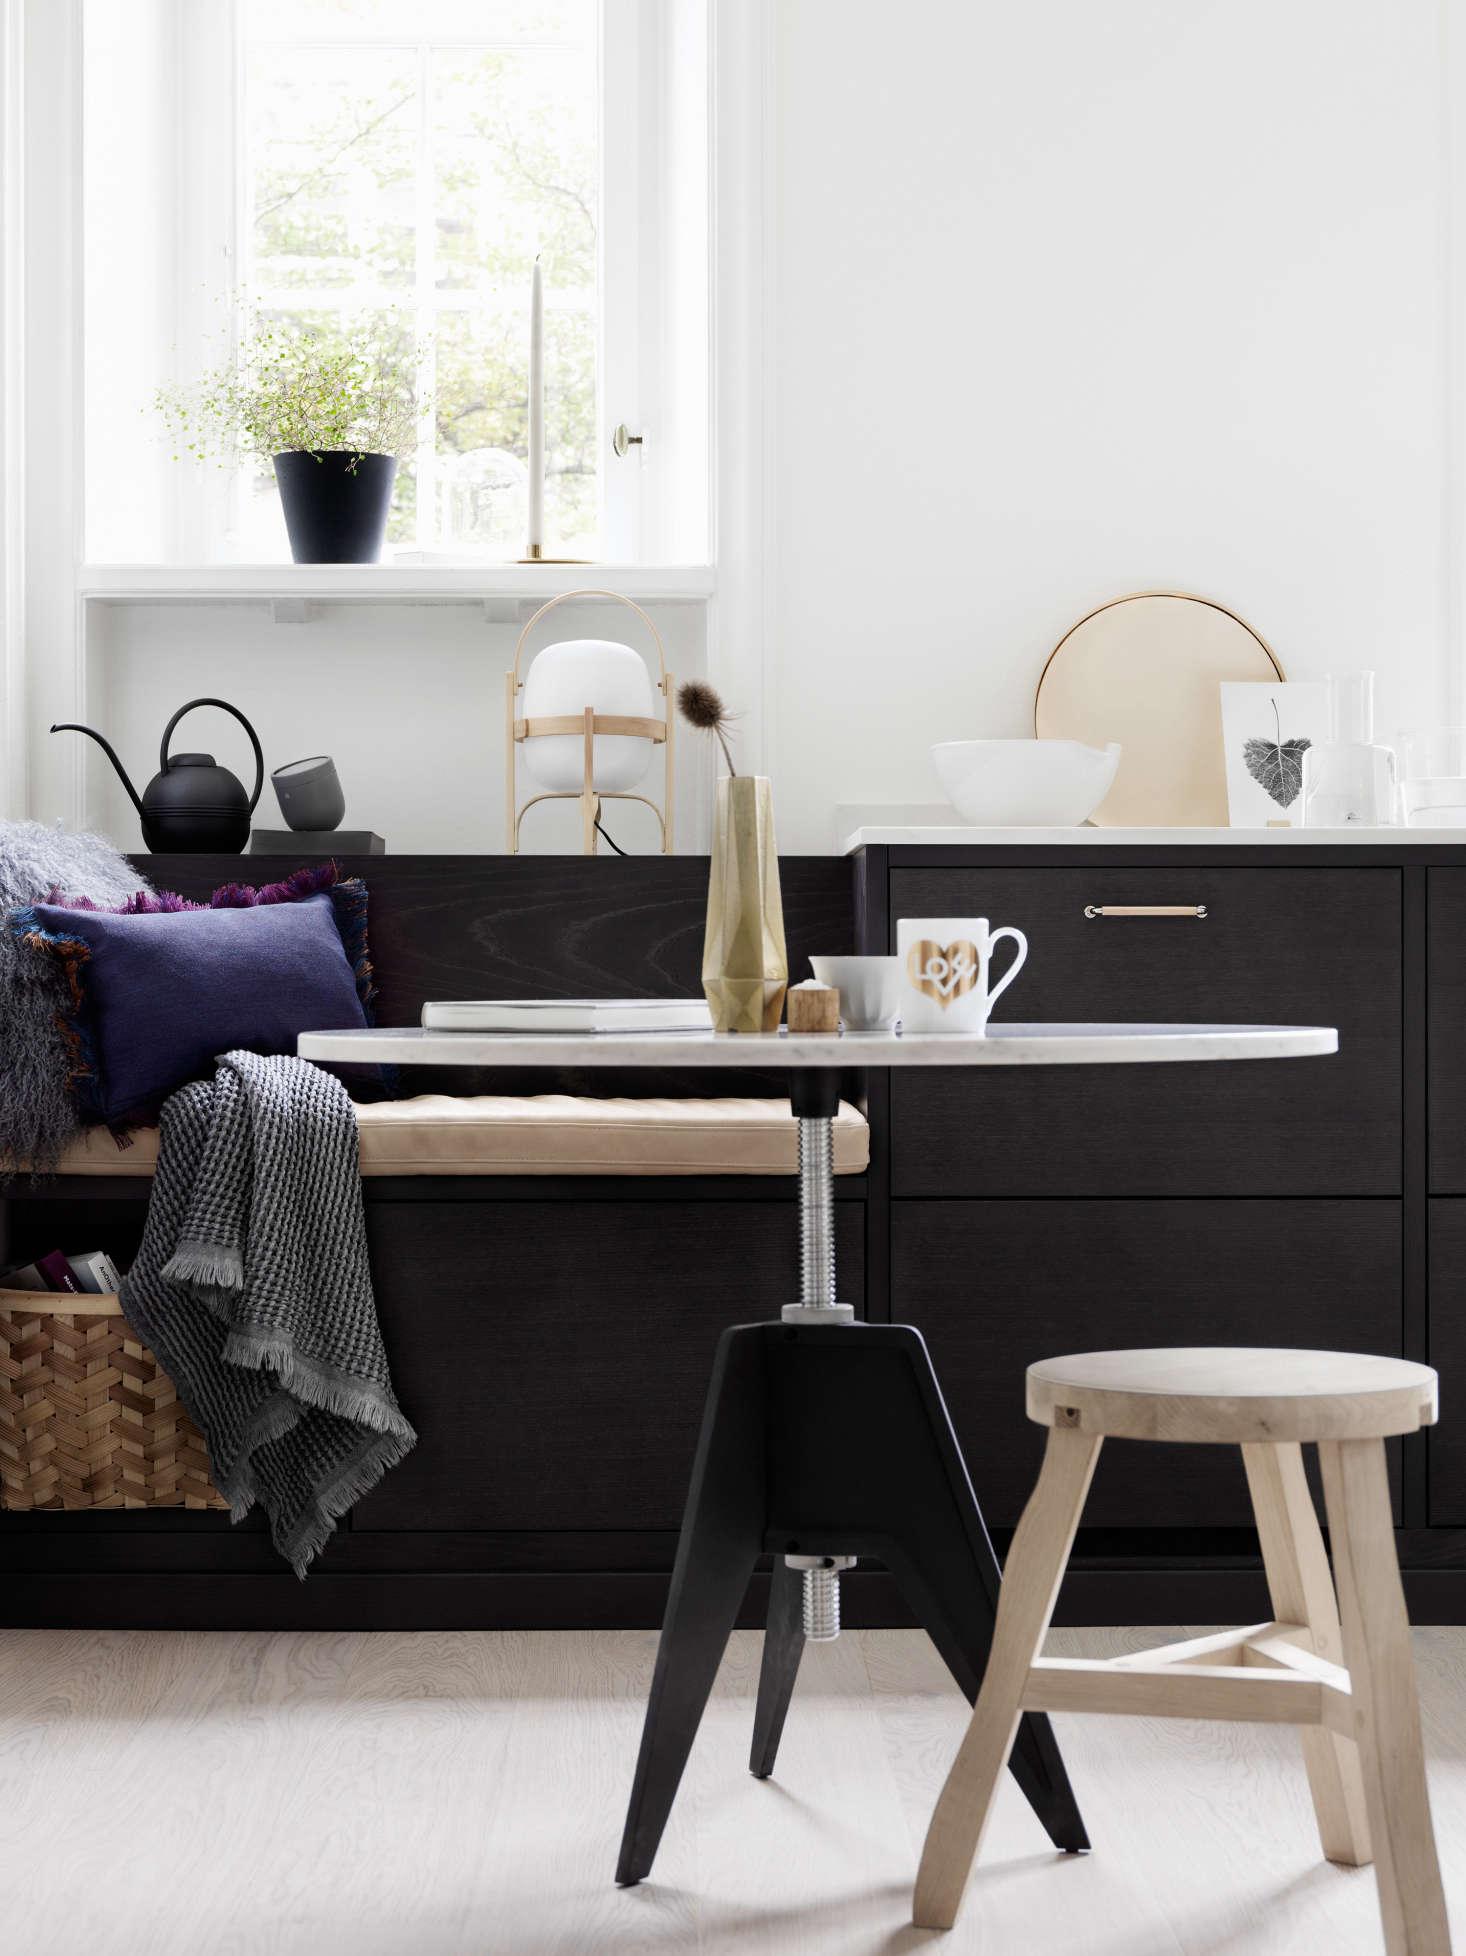 Bistro-kitchen-in-ash-brown-by-Ballingslov-of-Sweden-Remodelista-8